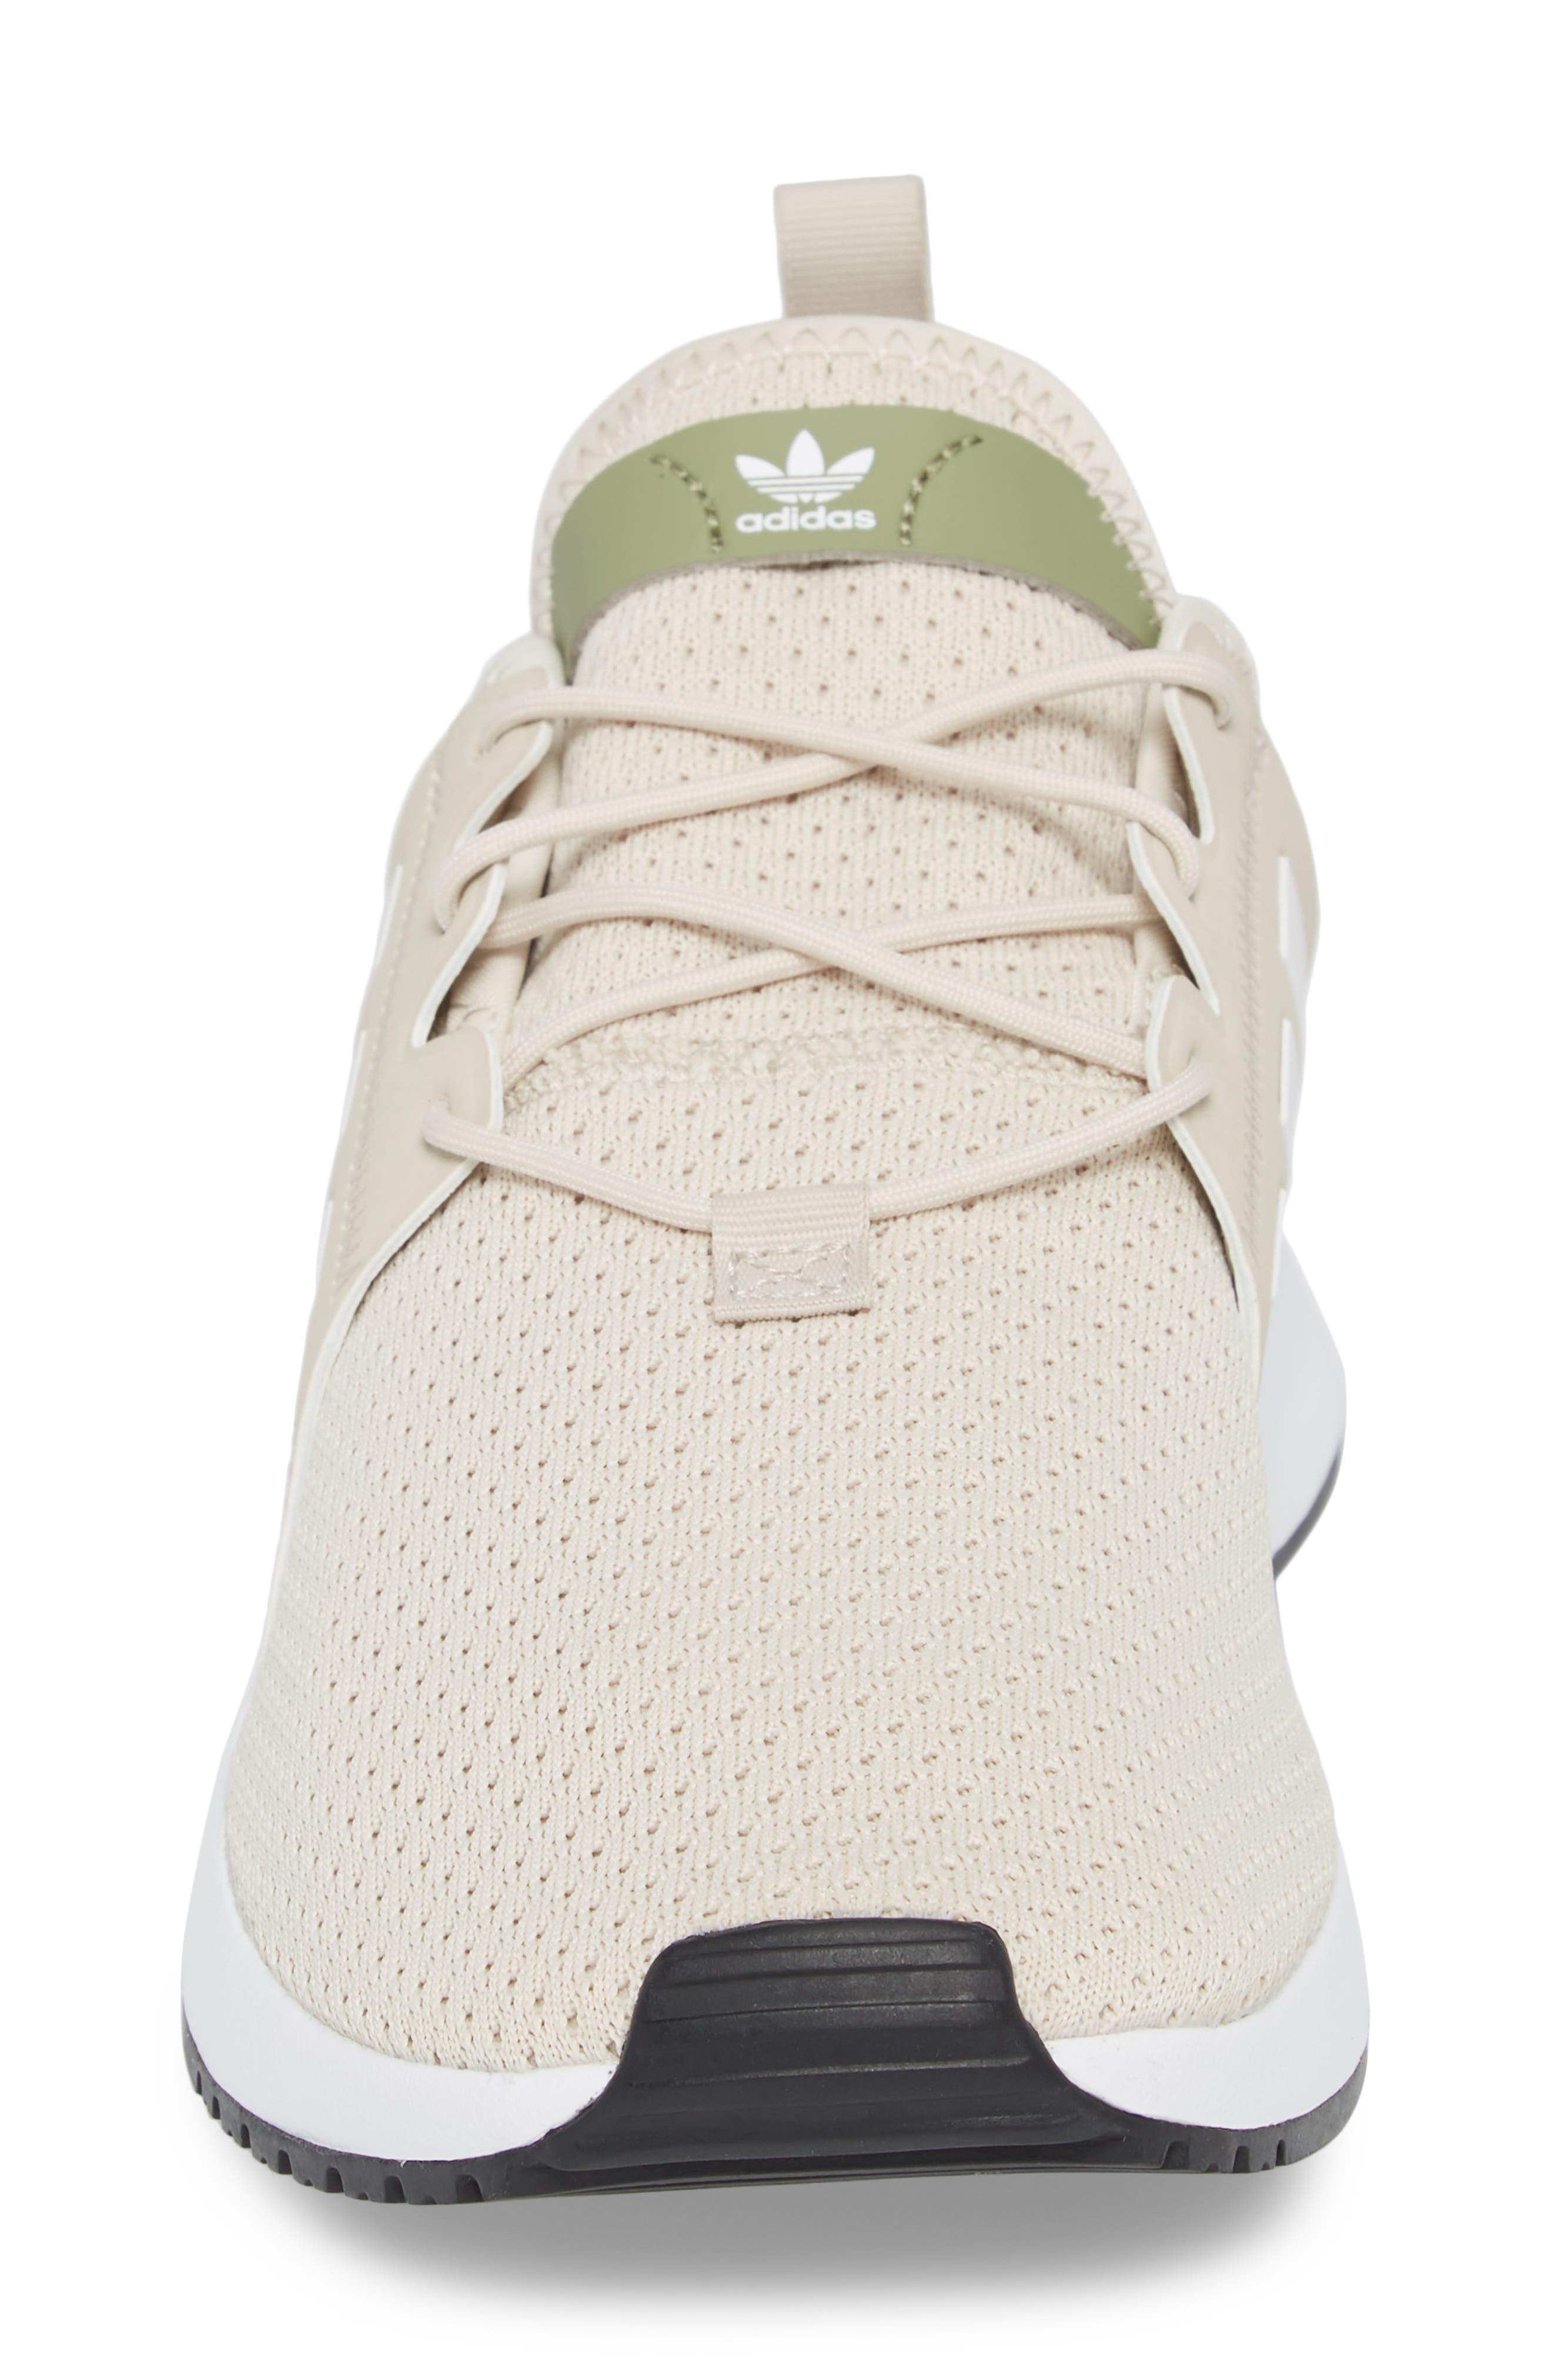 X_PLR Sneaker,                             Alternate thumbnail 4, color,                             Brown/ White / Trace Cargo